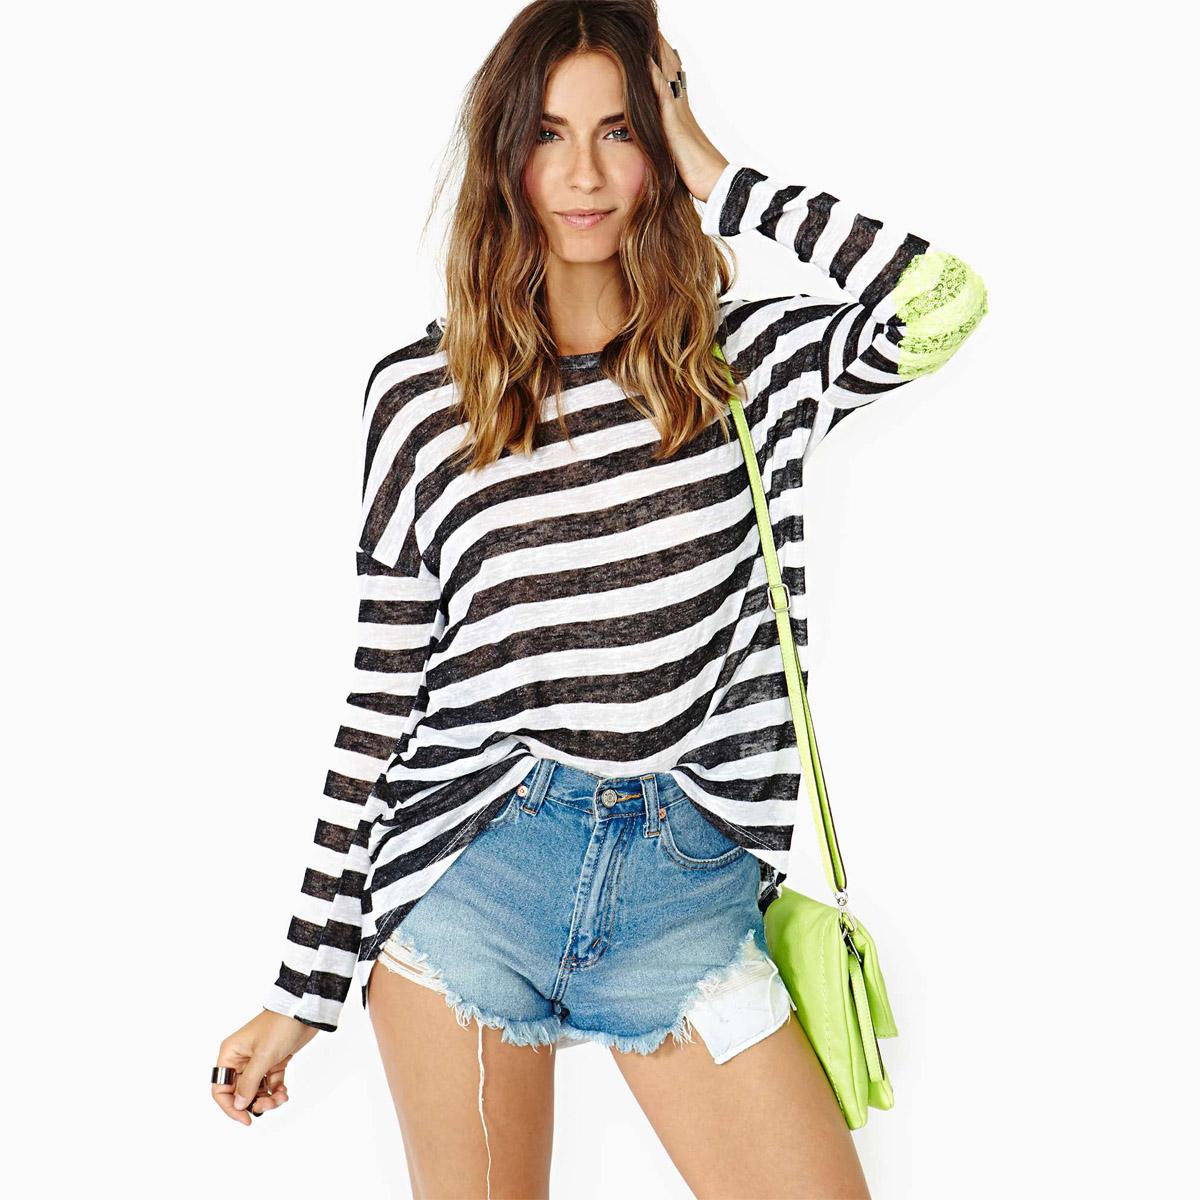 Женская футболка Brand new o haoduoyi HY249 женская футболка new brand 2015 o 8799